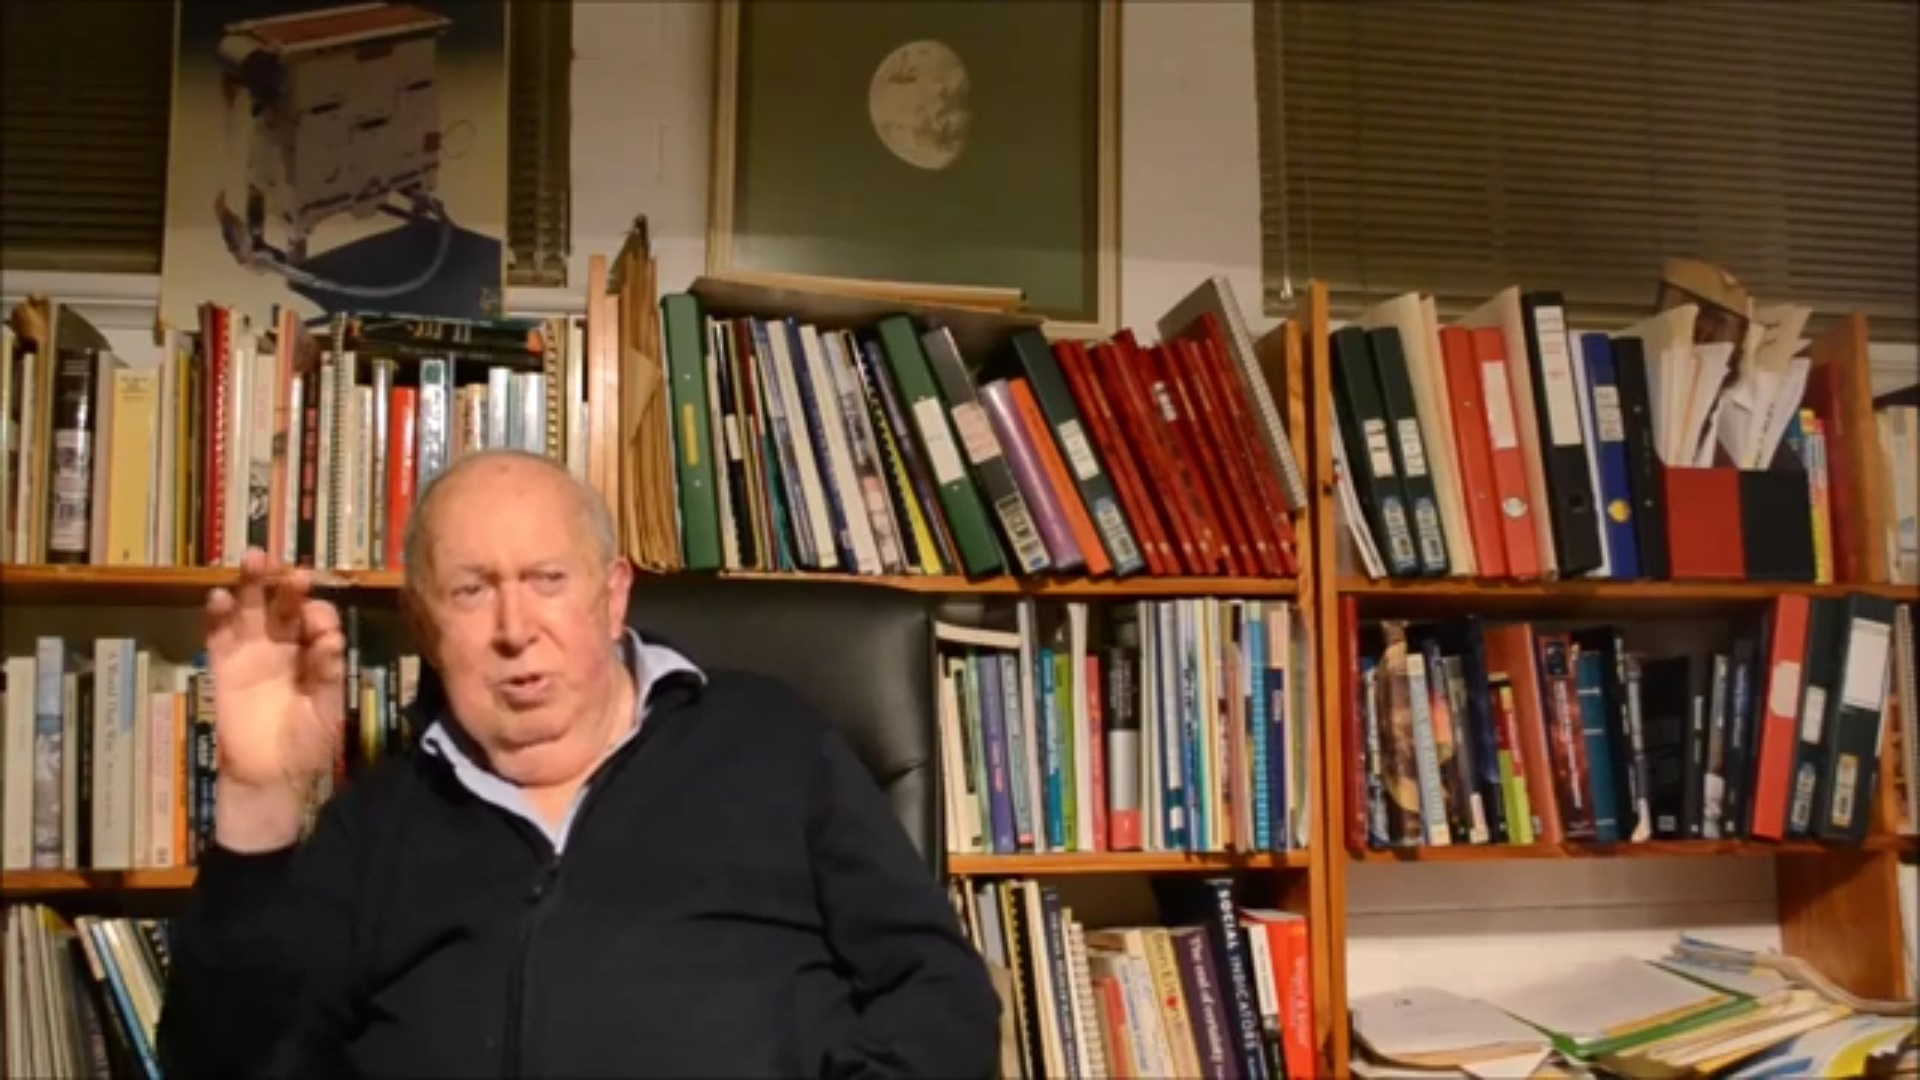 Professor Brian J. O'Brien at his home office. (Image credit: Space Hub Perth)